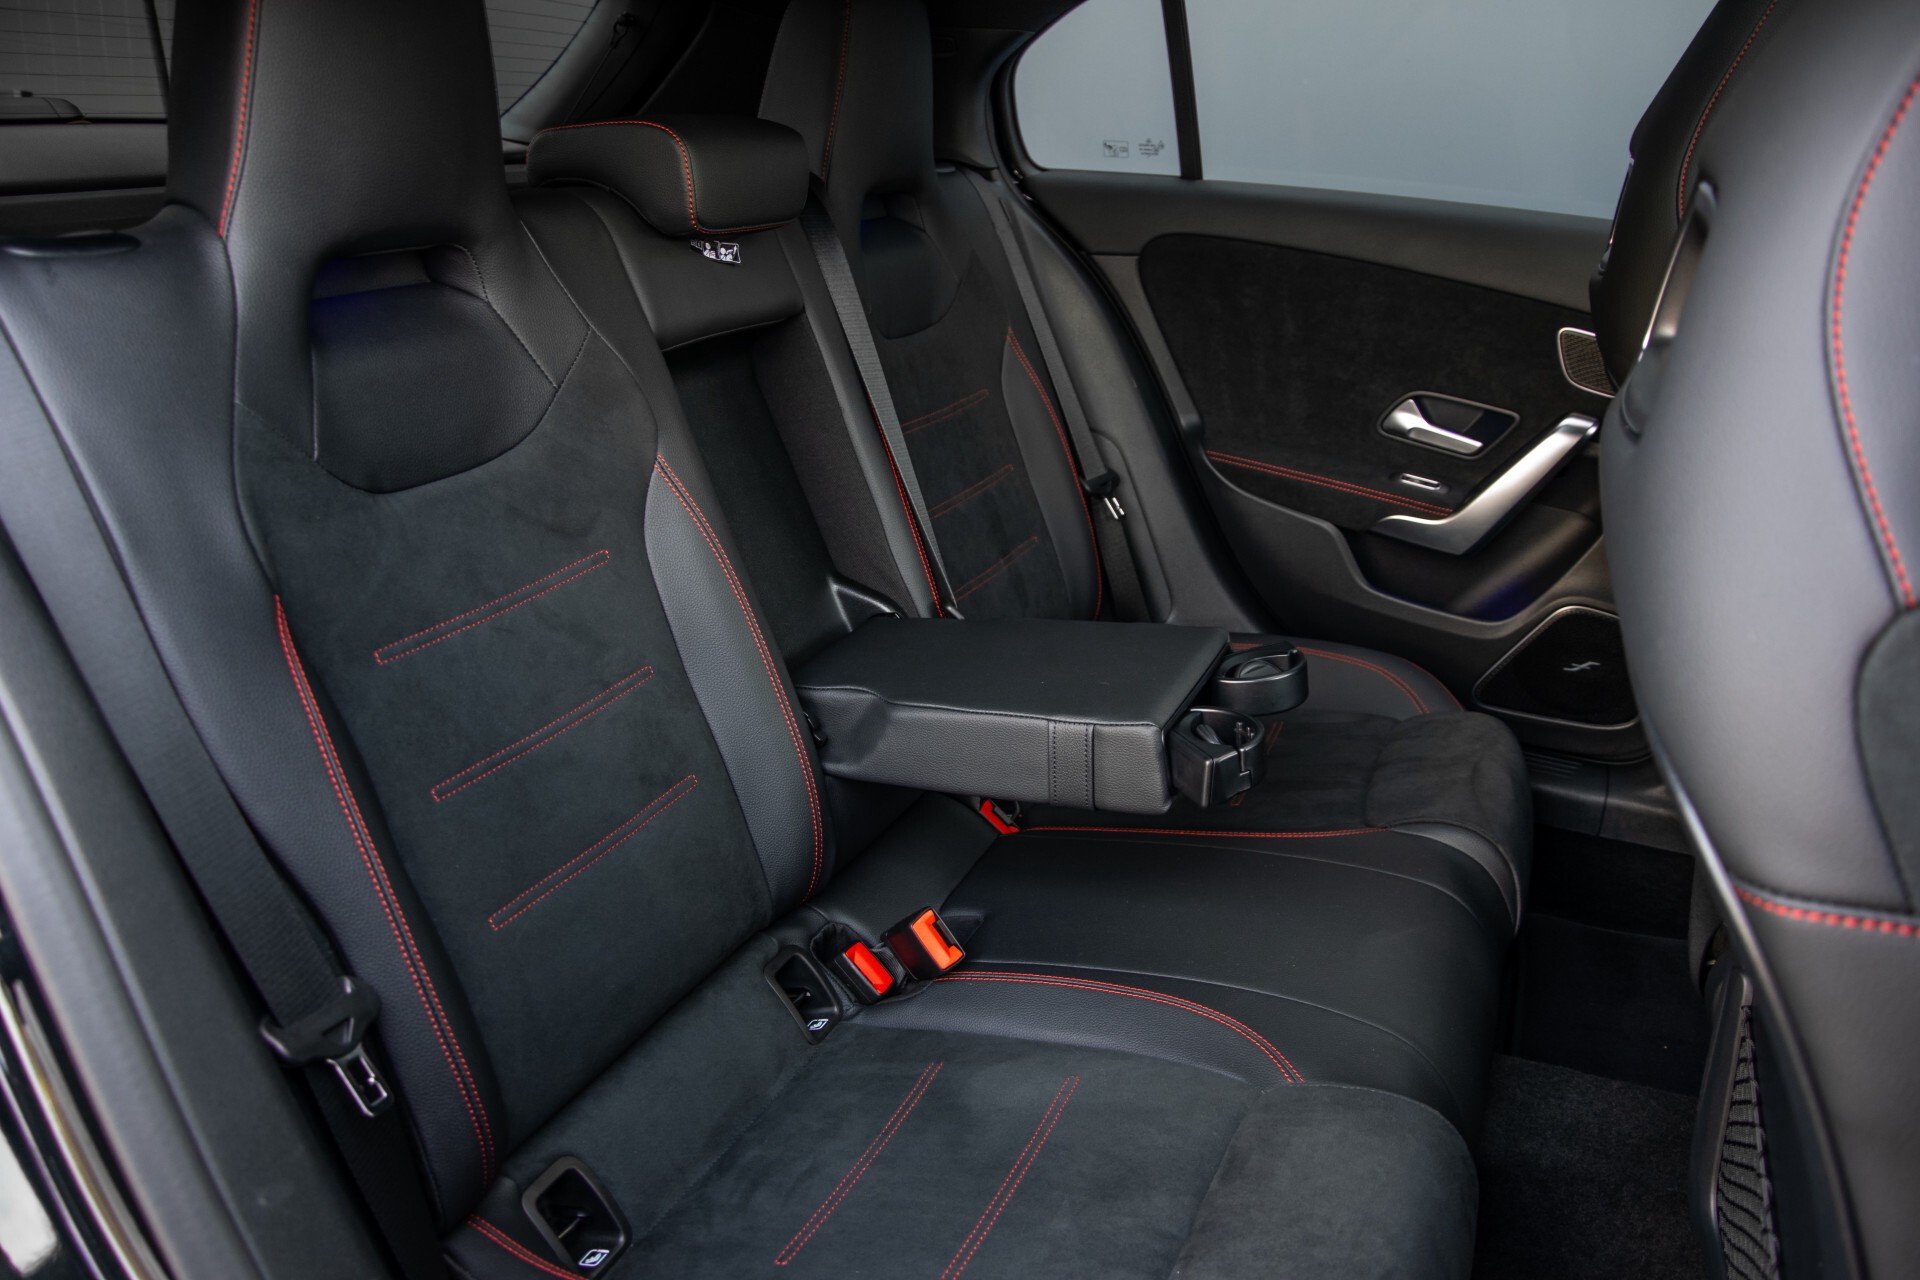 Mercedes-Benz A-Klasse 250 4-M AMG Panorama/Keyless-Entry/MBUX/HUD/Burmester/360/Multibeam LED Aut7 Foto 5